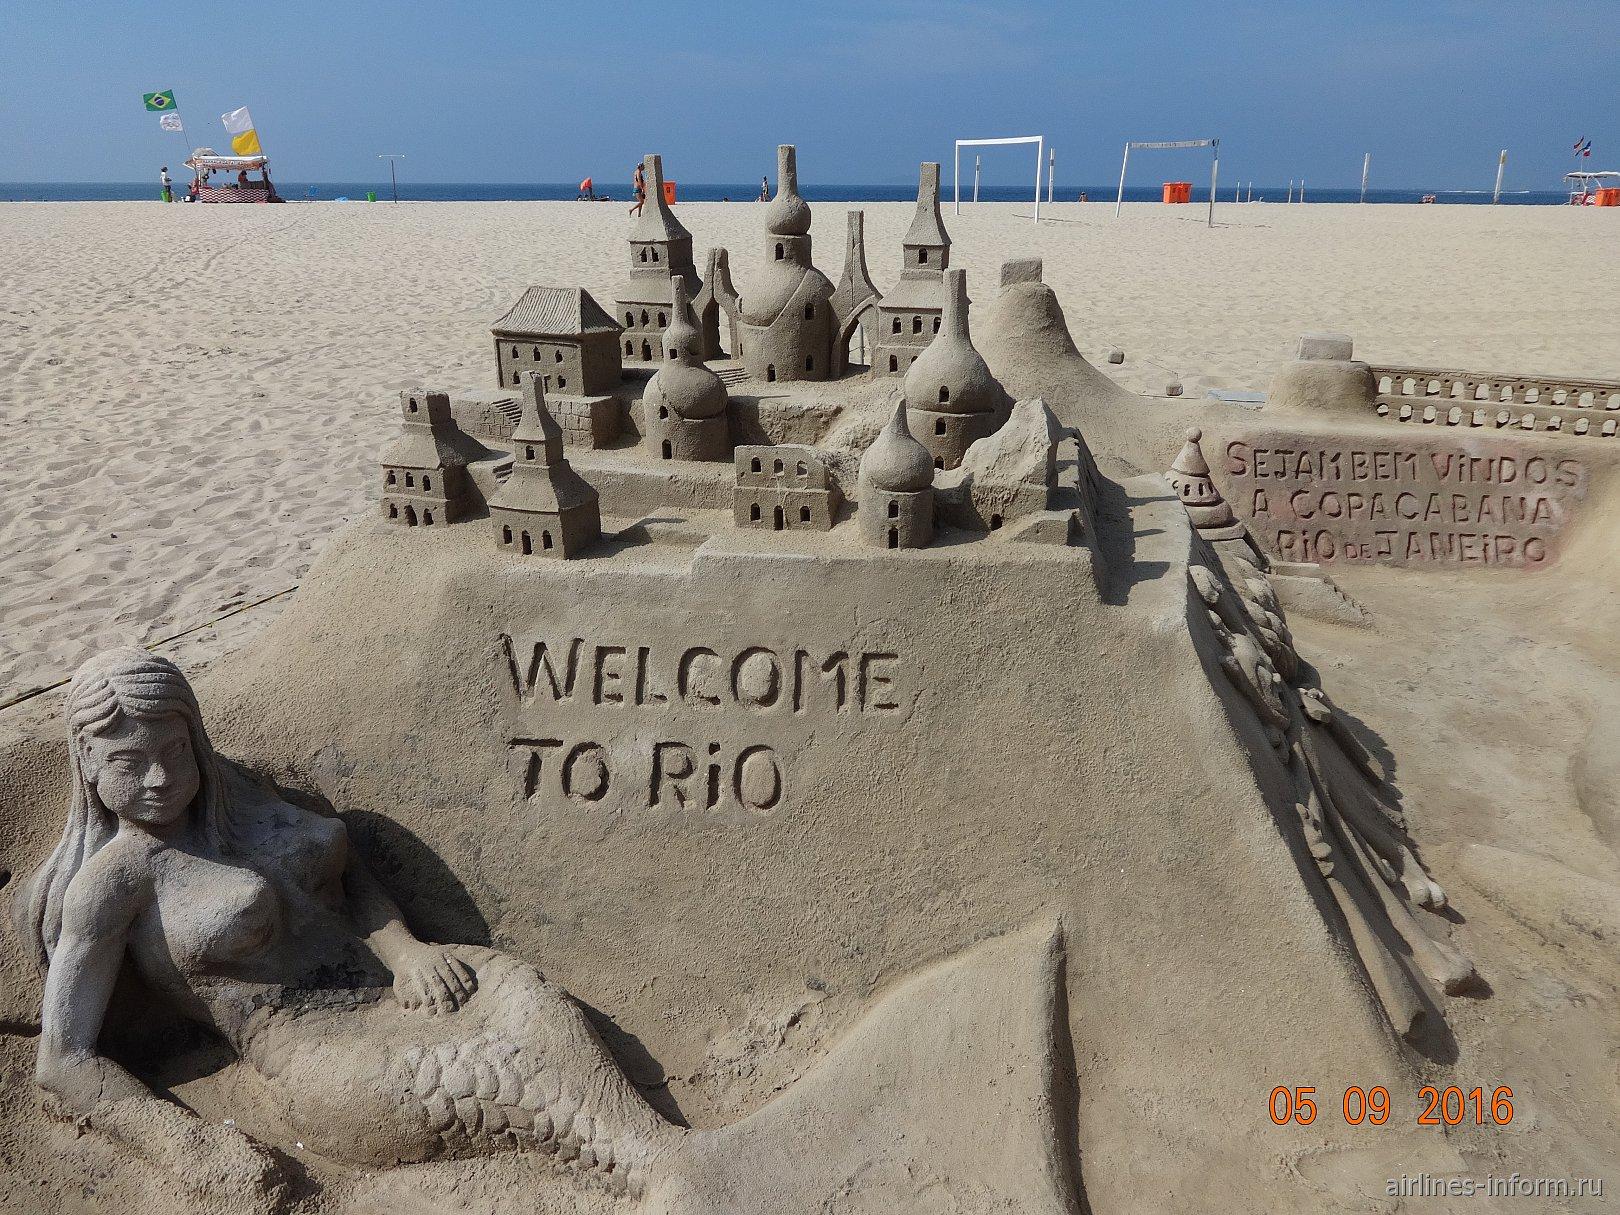 Паралимпийский Рио-де-Жанейро. Часть 3. Дубай-Рио-де-Жанейро с Emirates Б-777